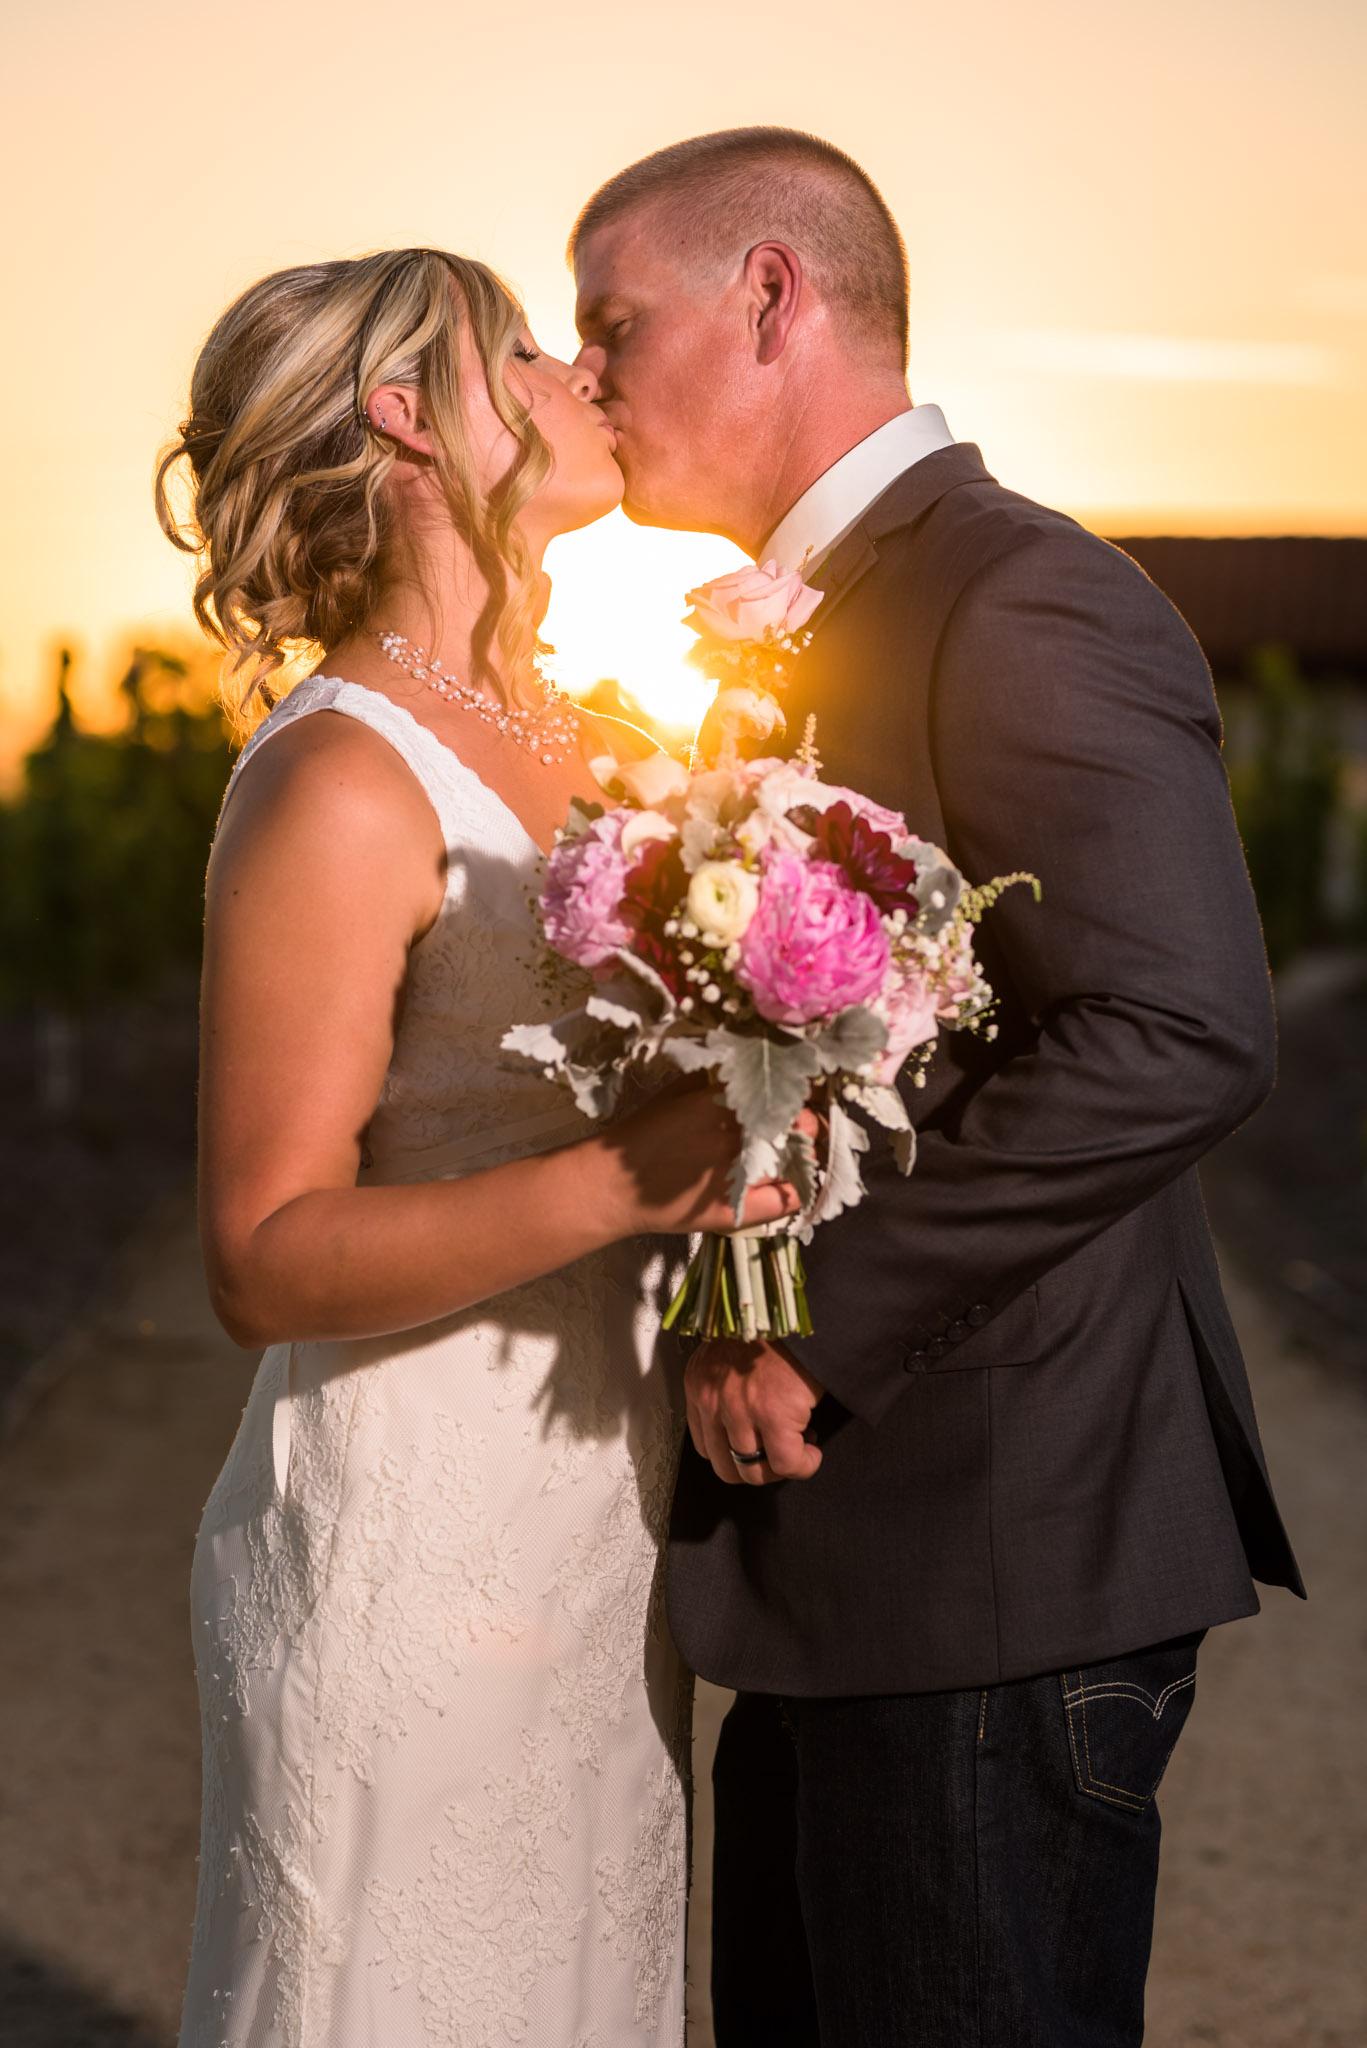 Avensole-Winery-Temecula-Wedding-Josh-and-Olivia-3805.JPG